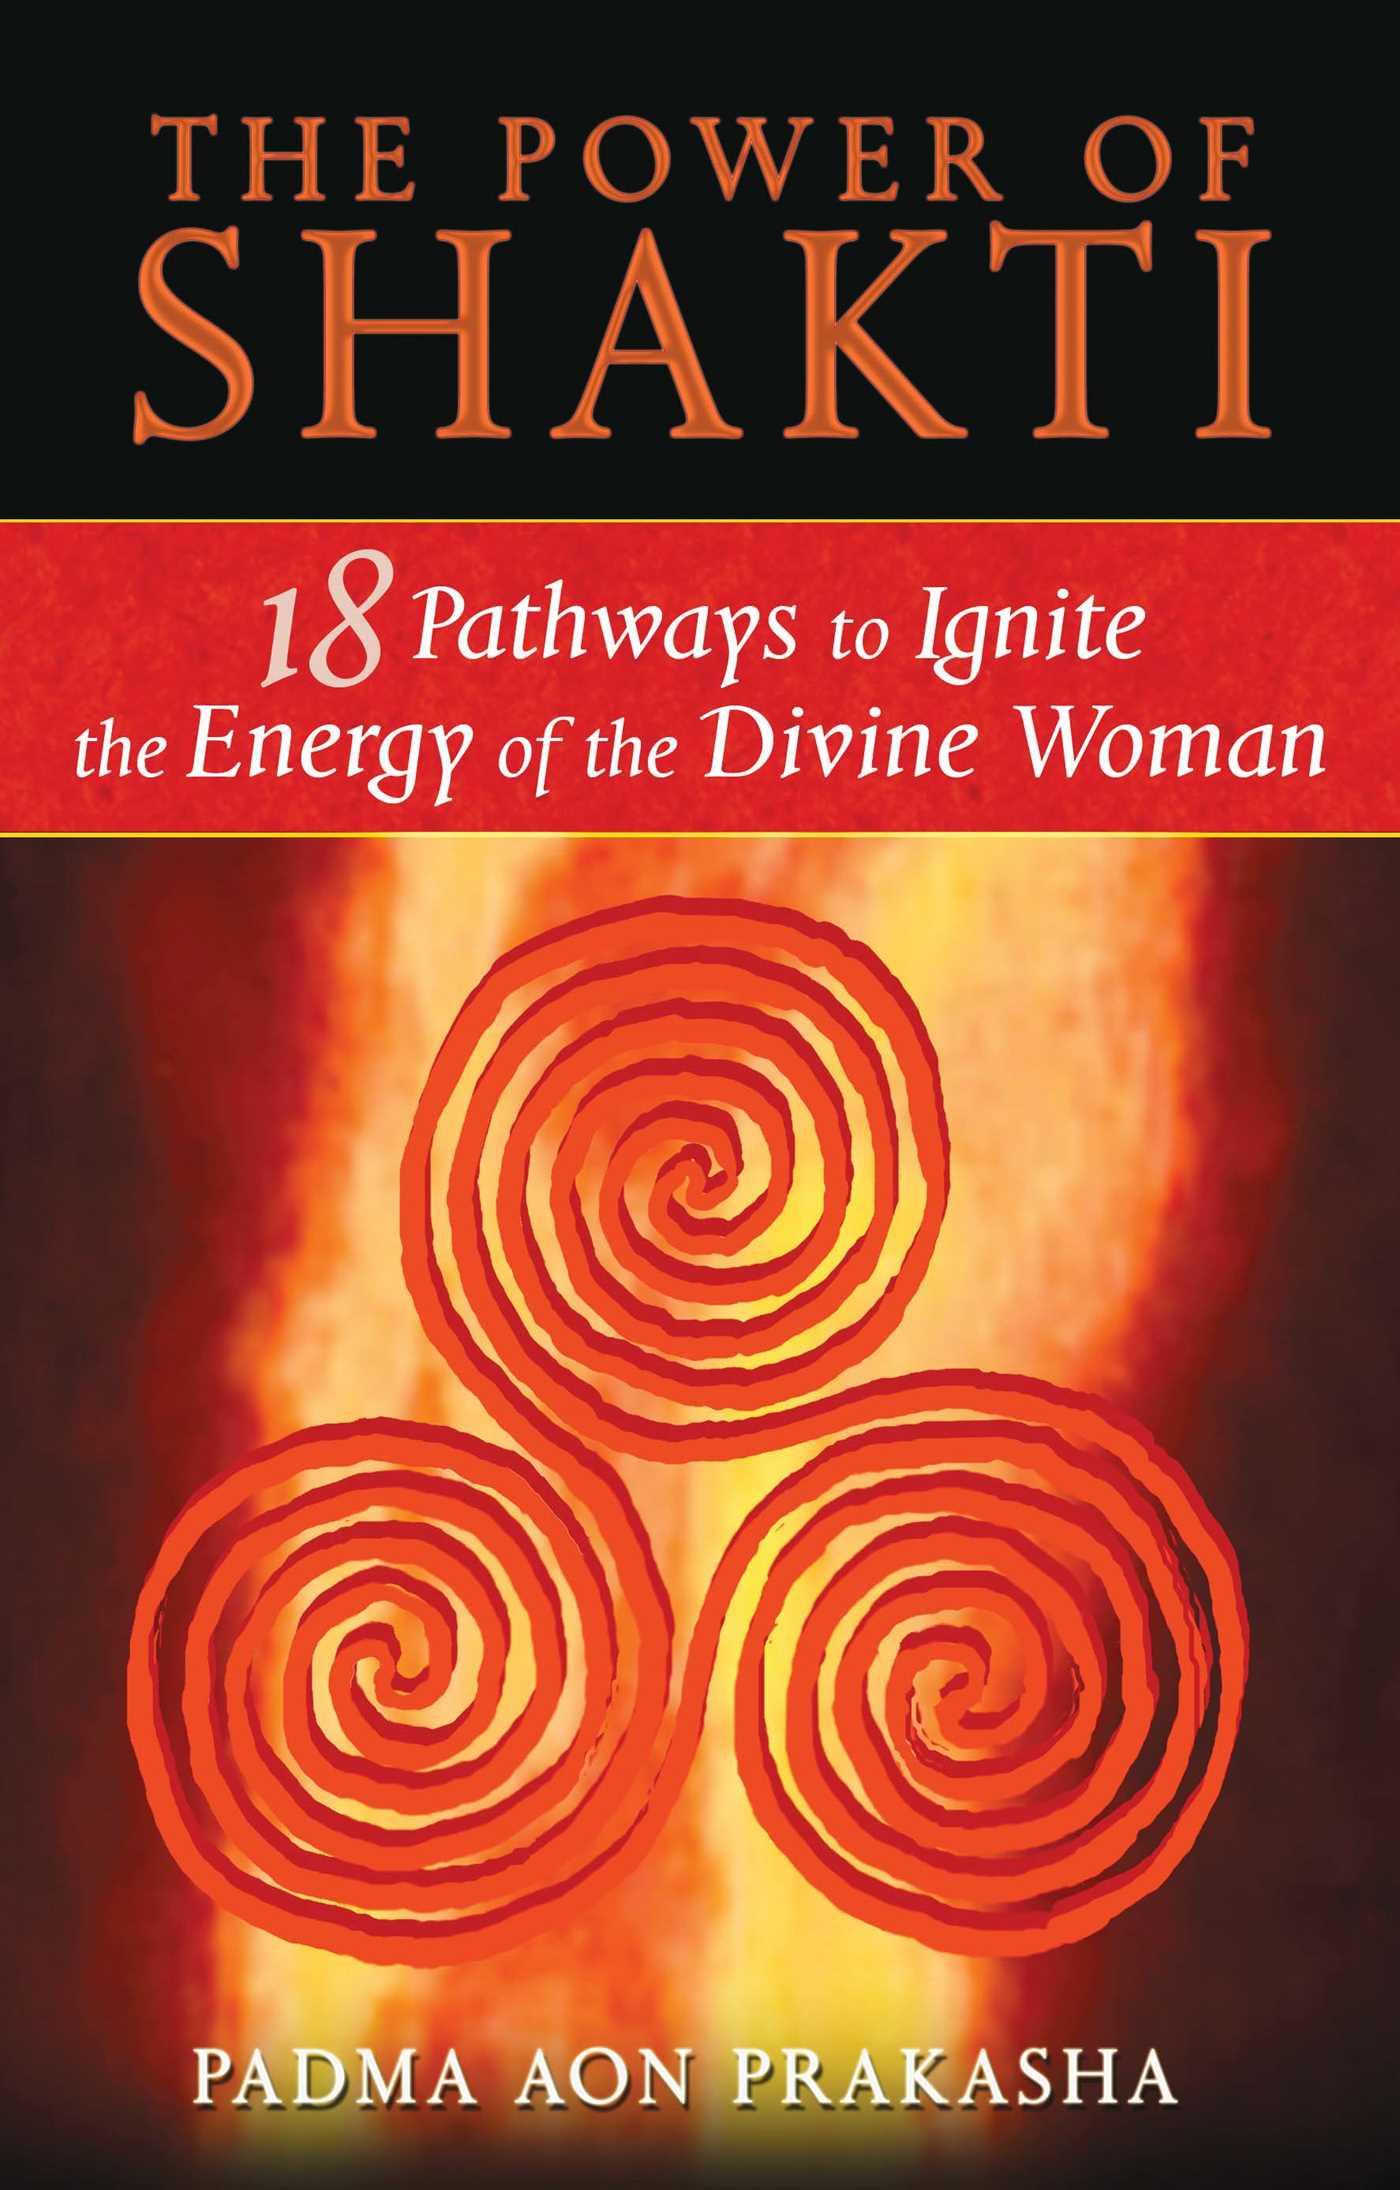 the power of shakti book by padma aon prakasha official